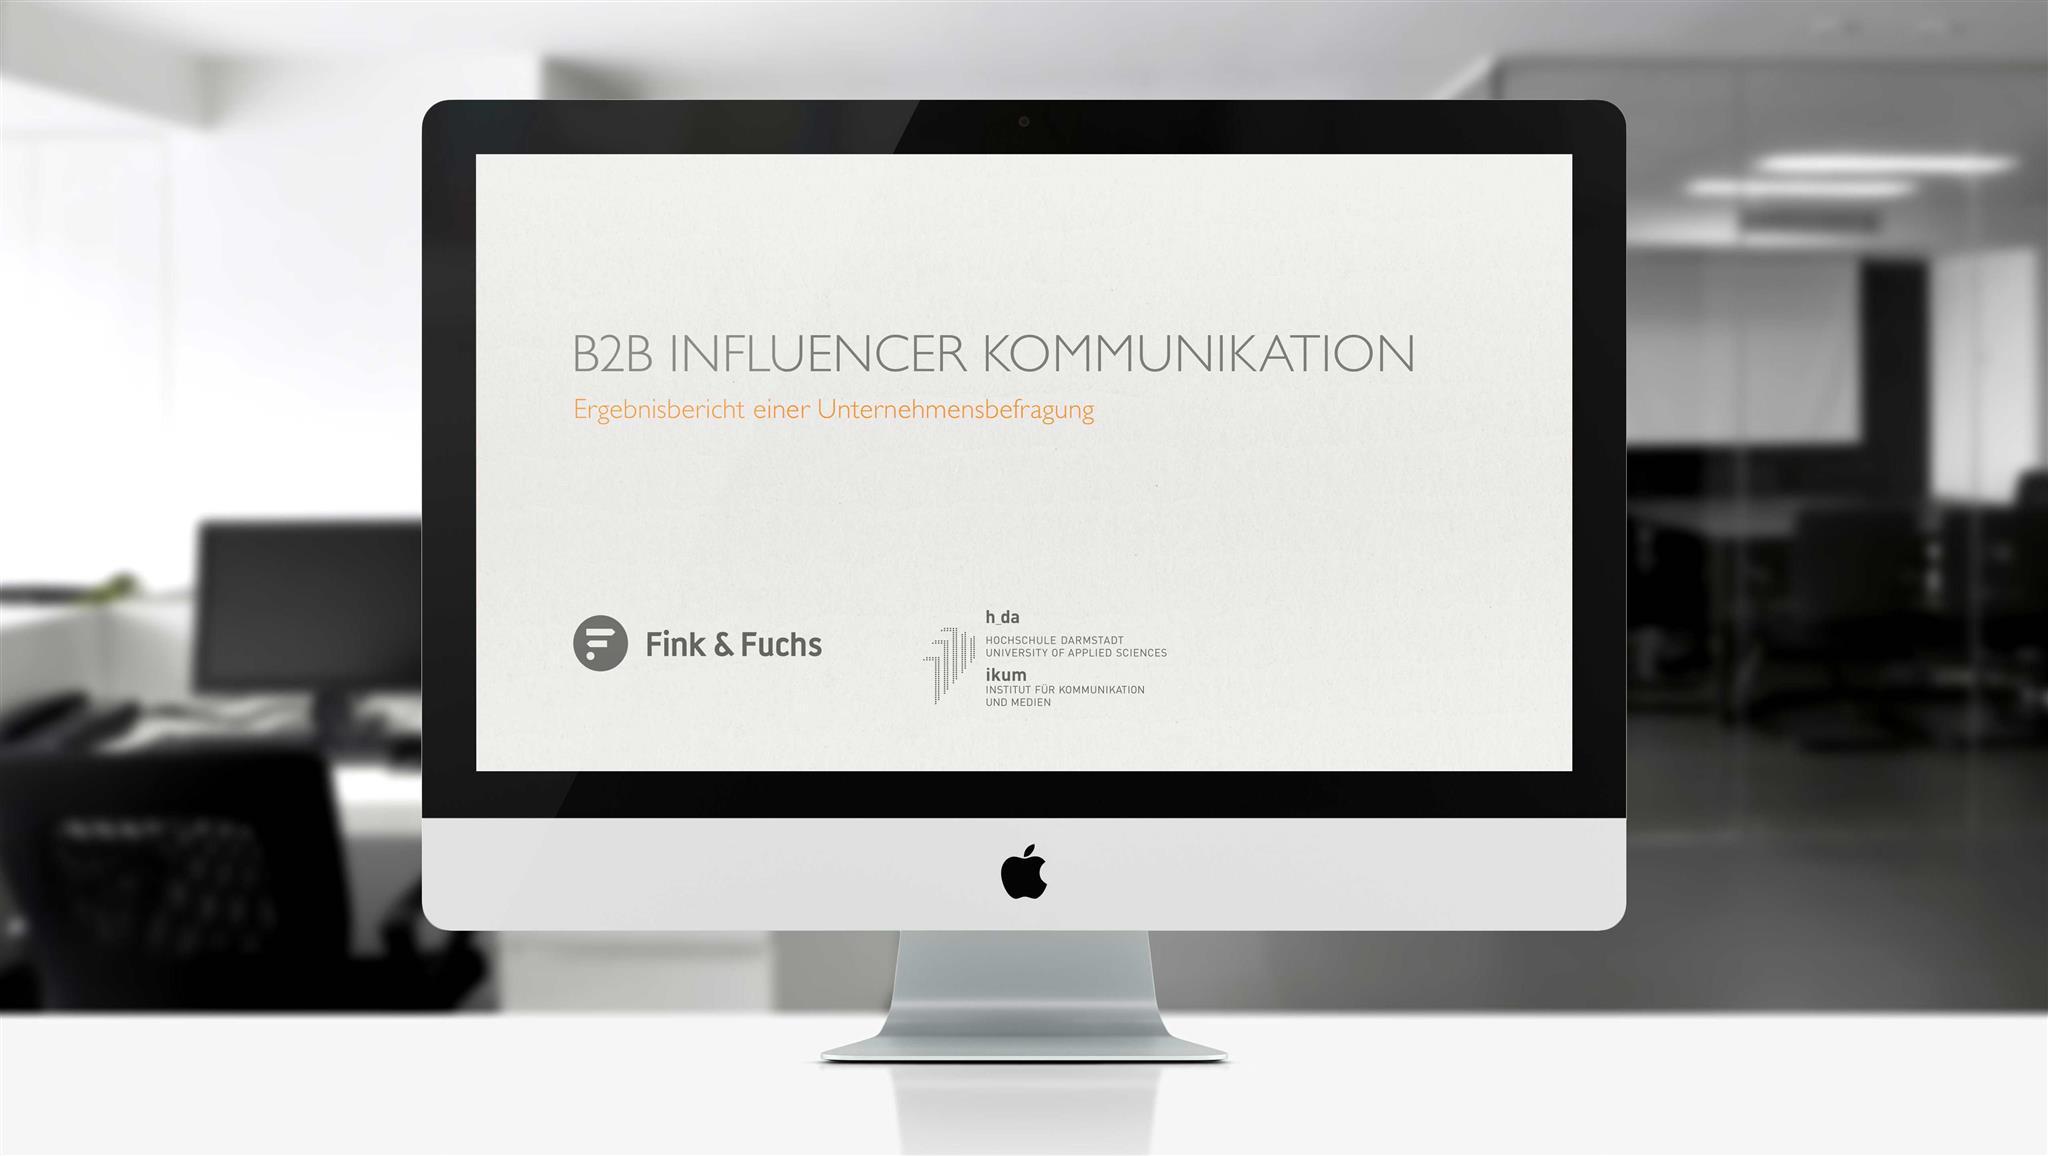 (c) B2binfluencer.de